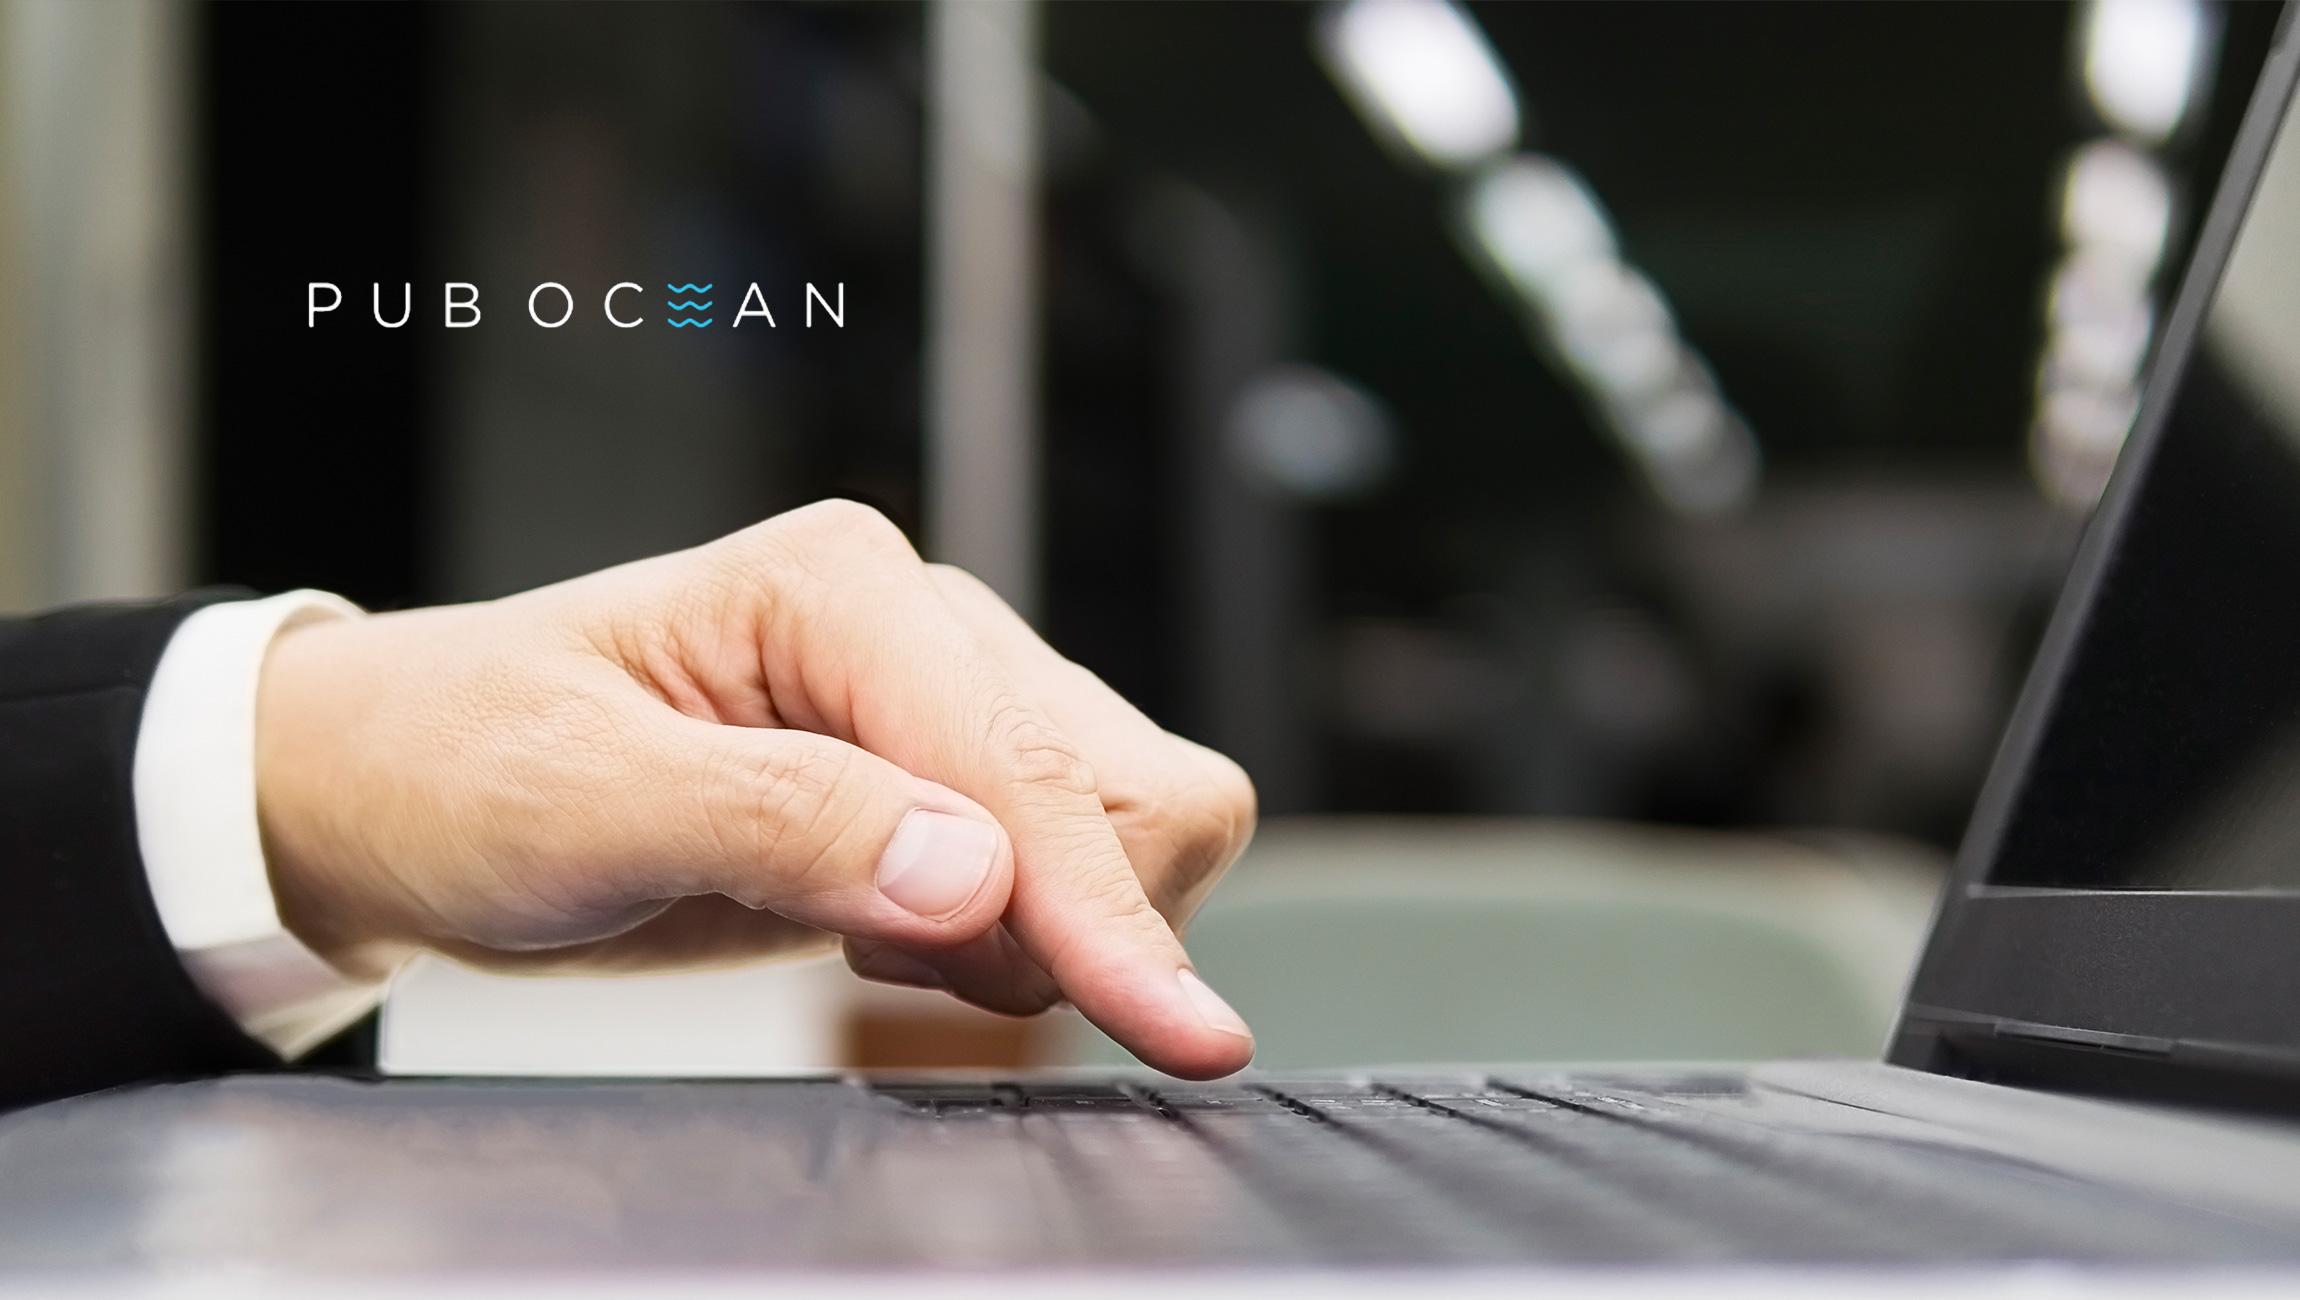 Pub Ocean Provides Publishers with Revenue Attribution Tool Through PubExchange Partnership